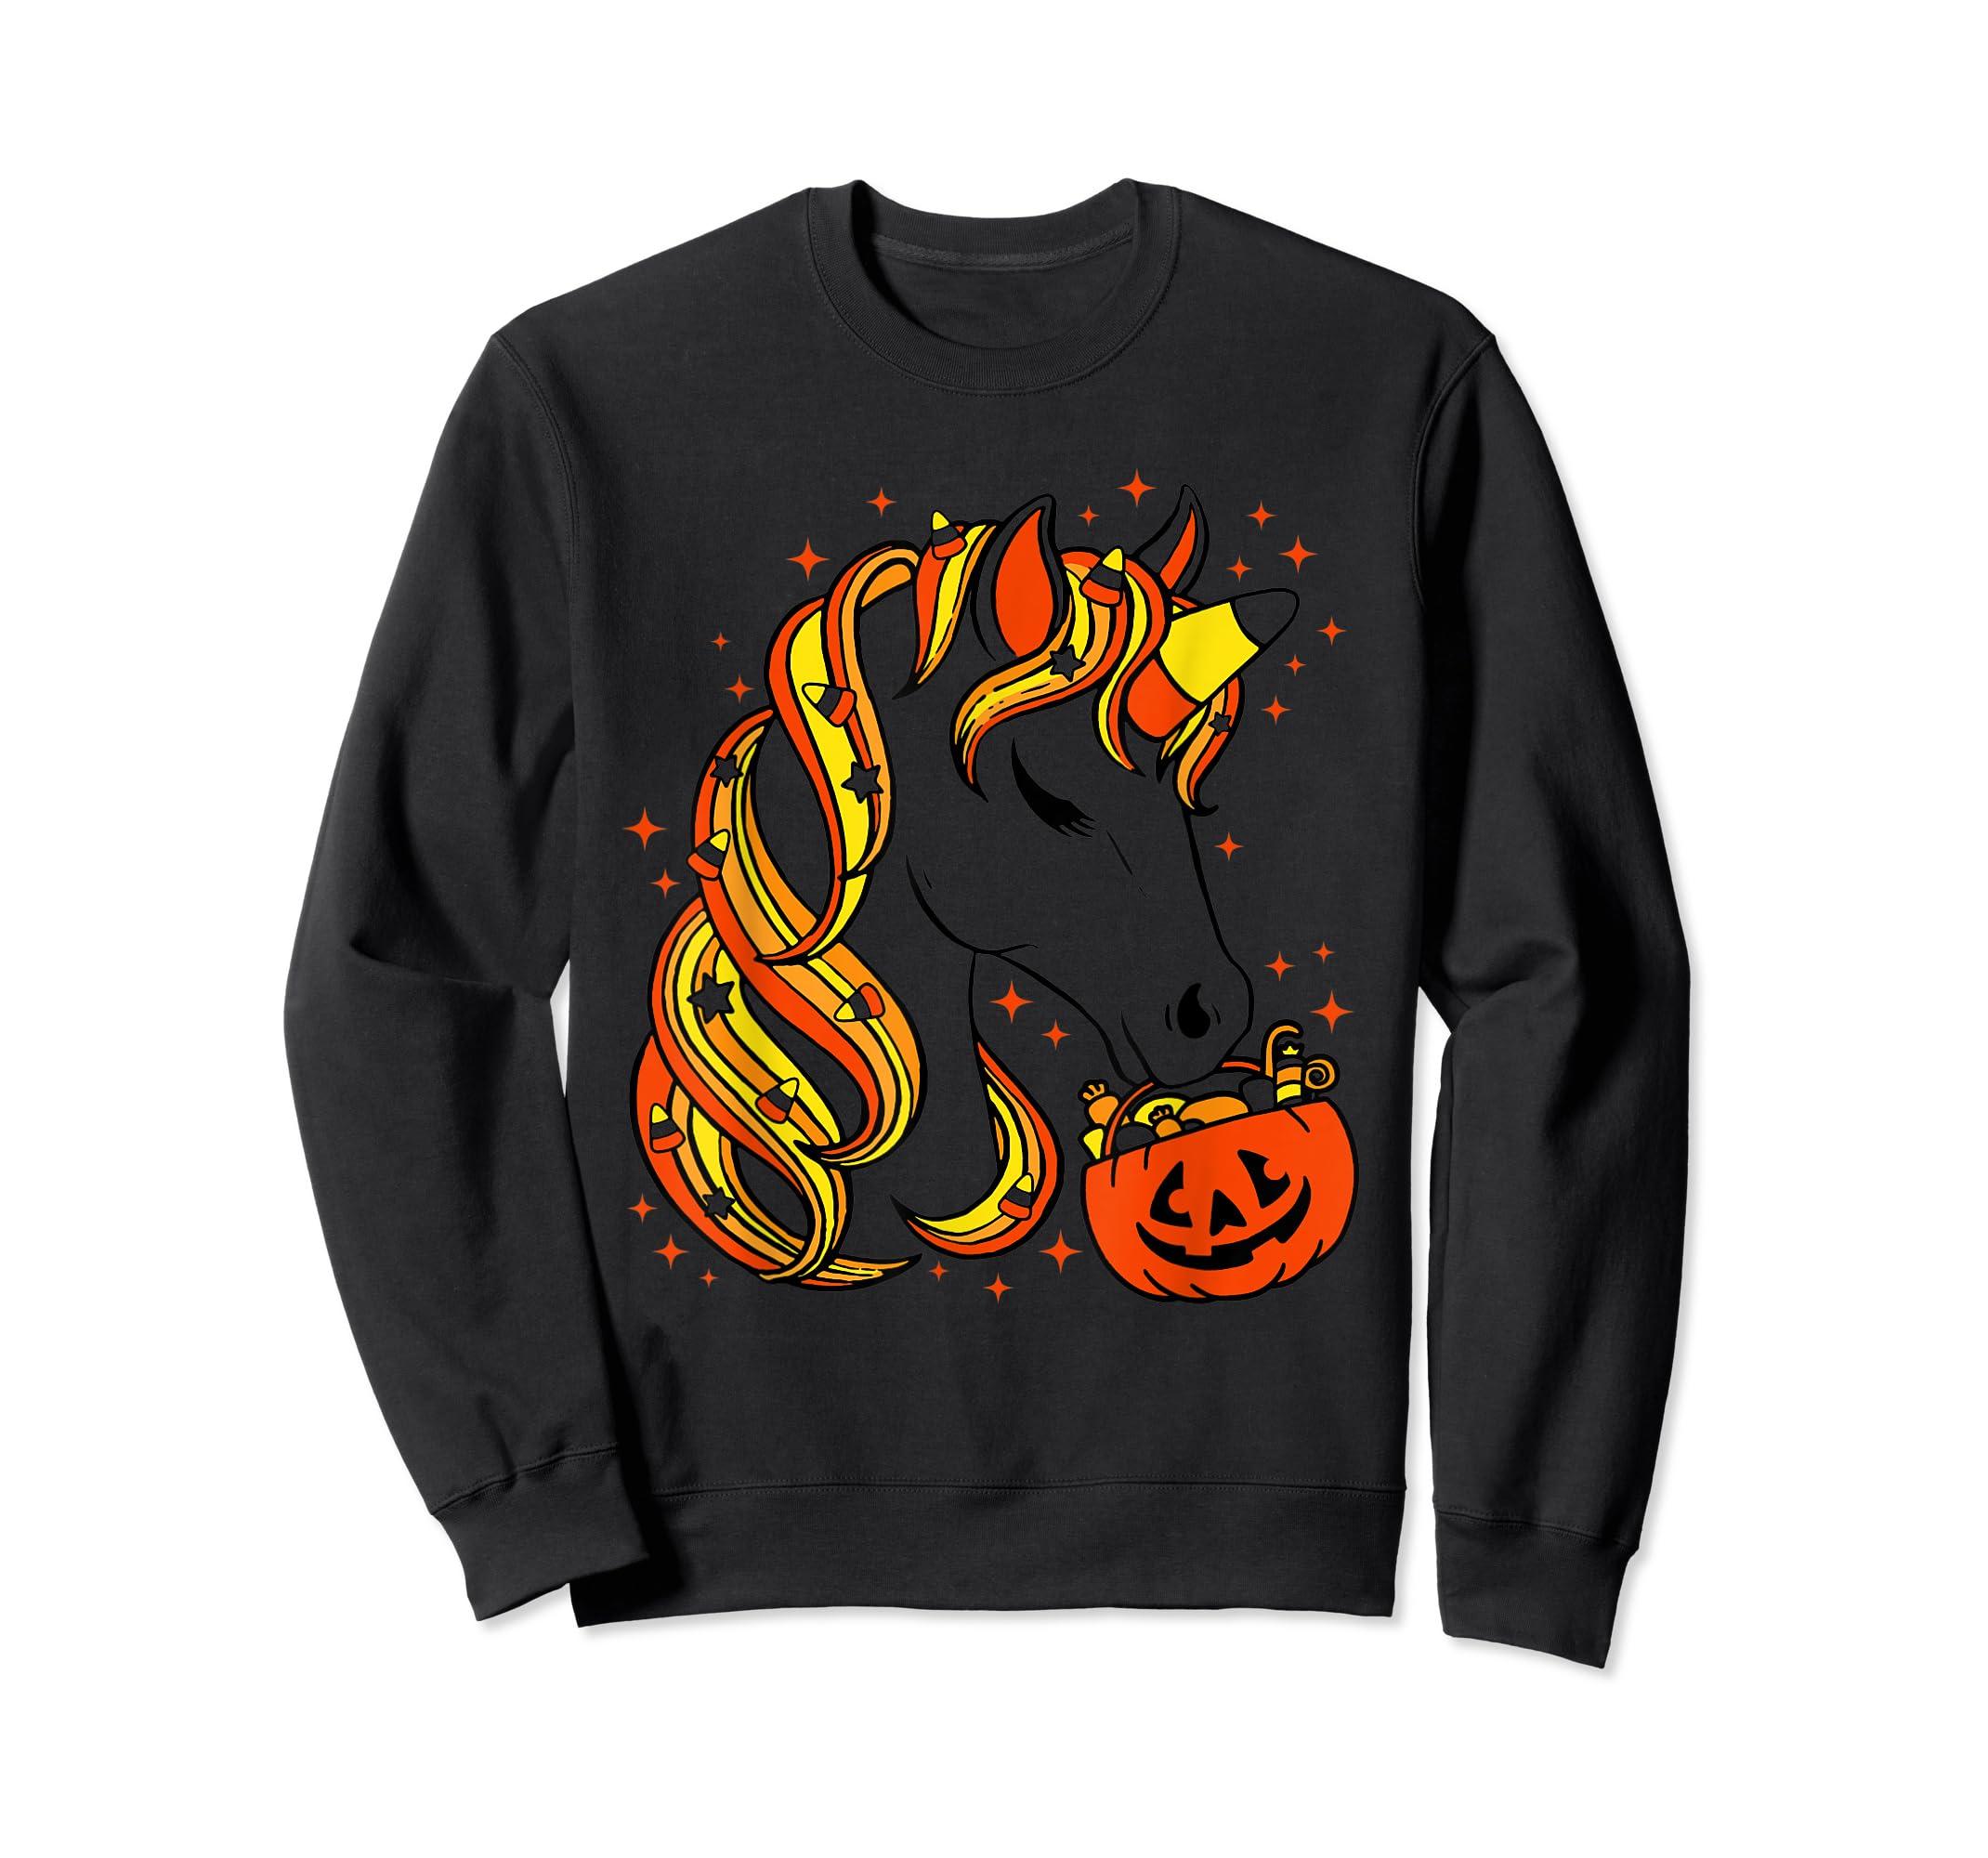 Cute Candy Corn Unicorn Halloween Top T-Shirt-Sweatshirt-Black